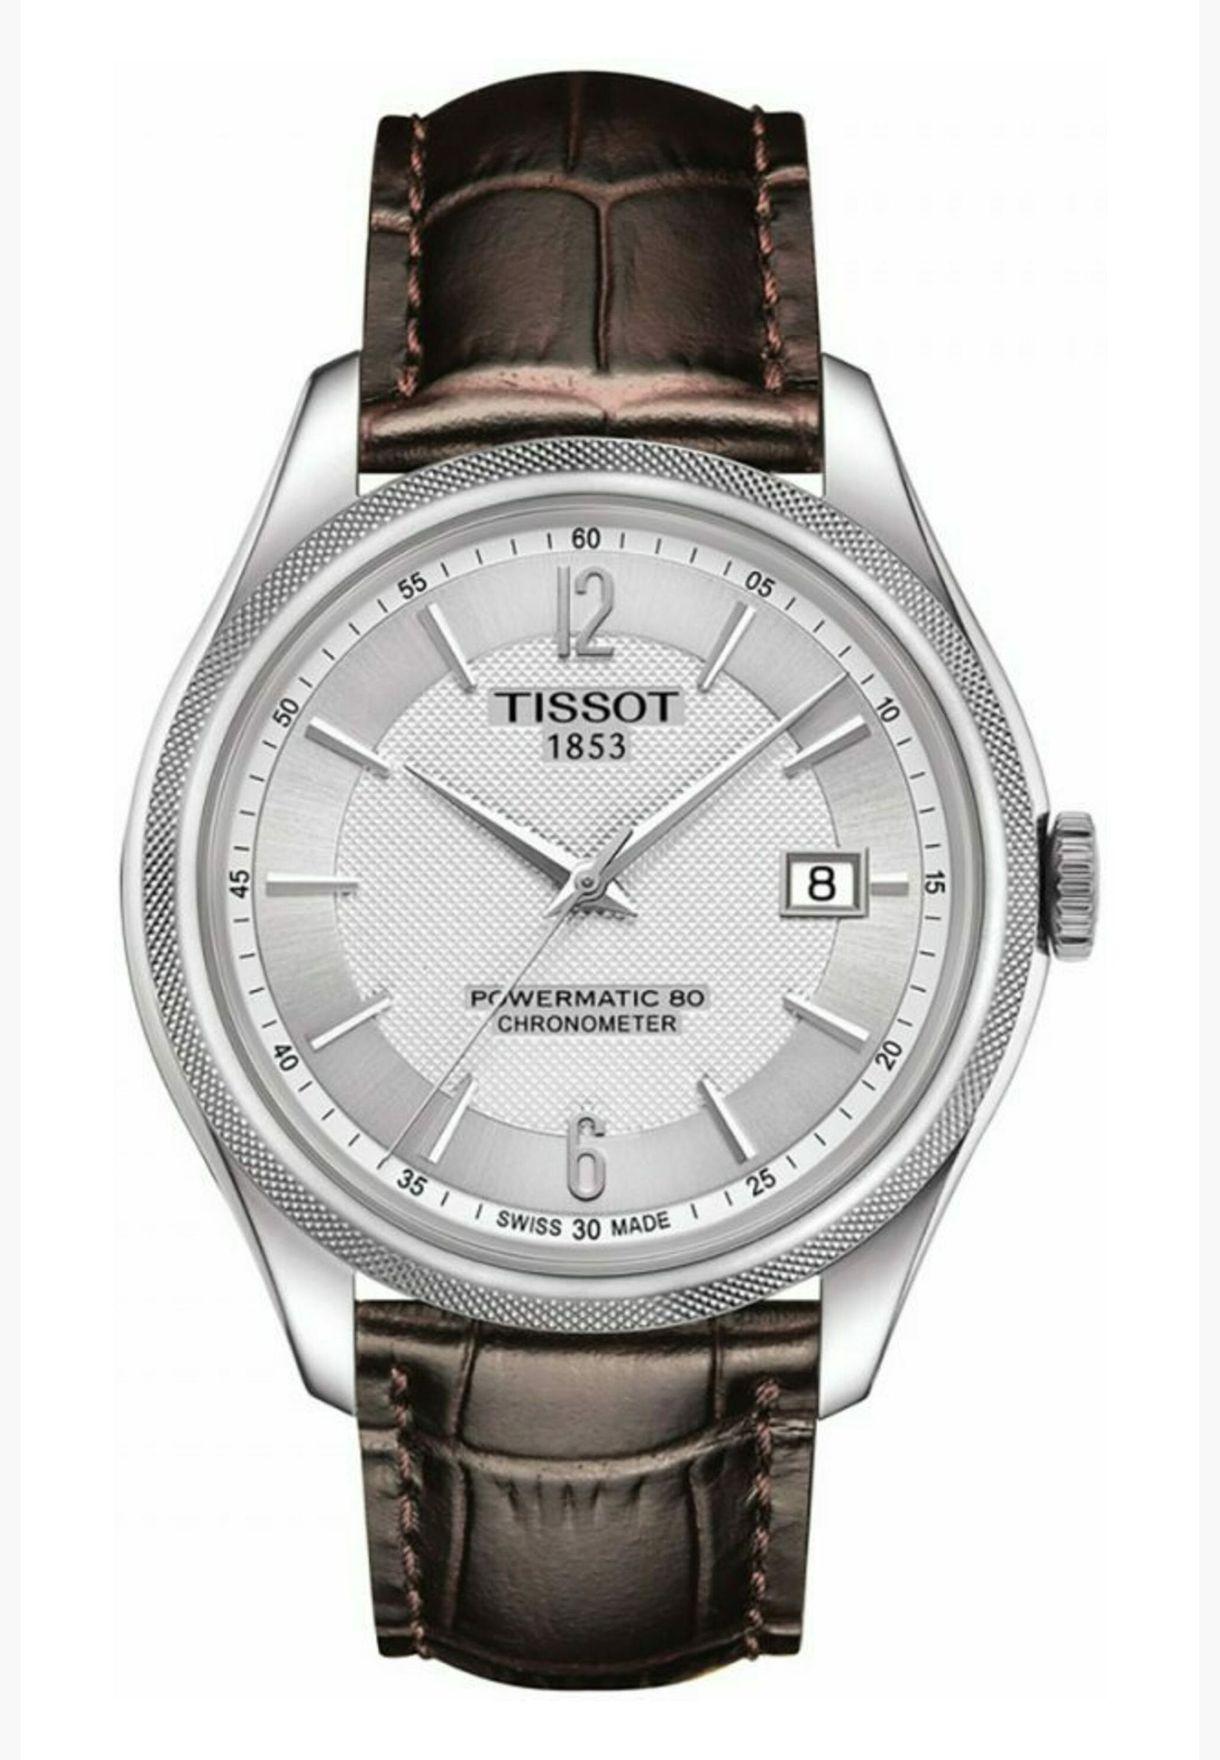 ساعة تيسو باليد بسوار جلدي - T108.408.16.037.00